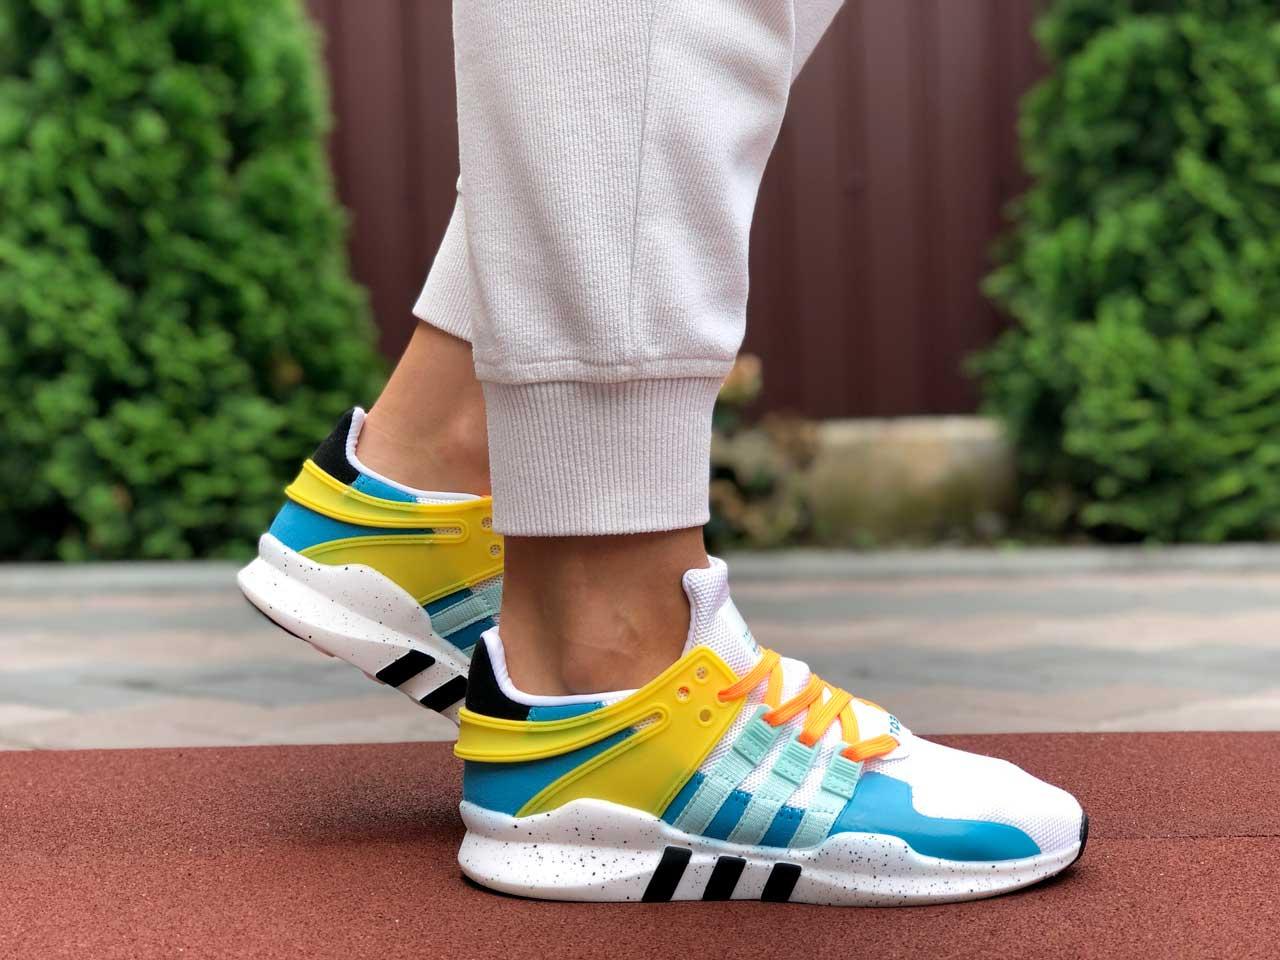 Adidas EQT Running белые с голубым